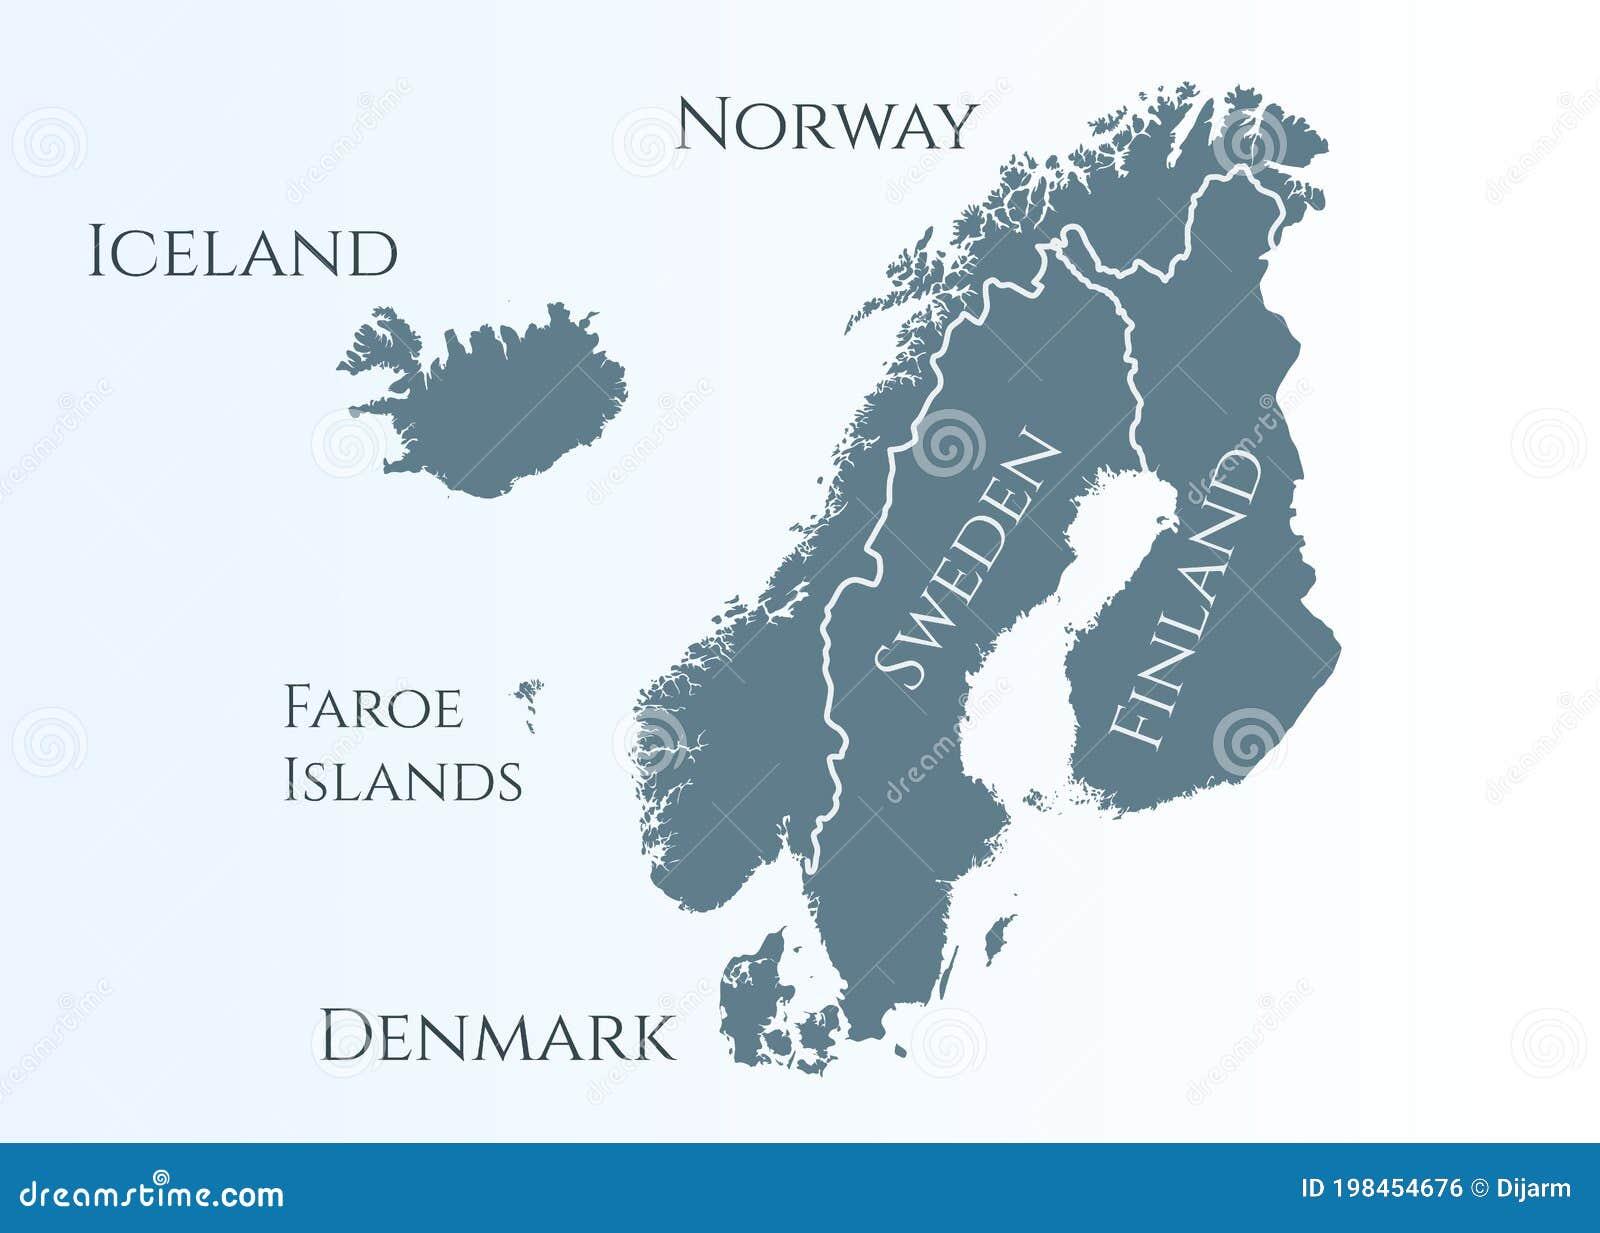 Picture of: Scandinavia Map Finland Sweden Denmark Norway Stock Illustrations 460 Scandinavia Map Finland Sweden Denmark Norway Stock Illustrations Vectors Clipart Dreamstime